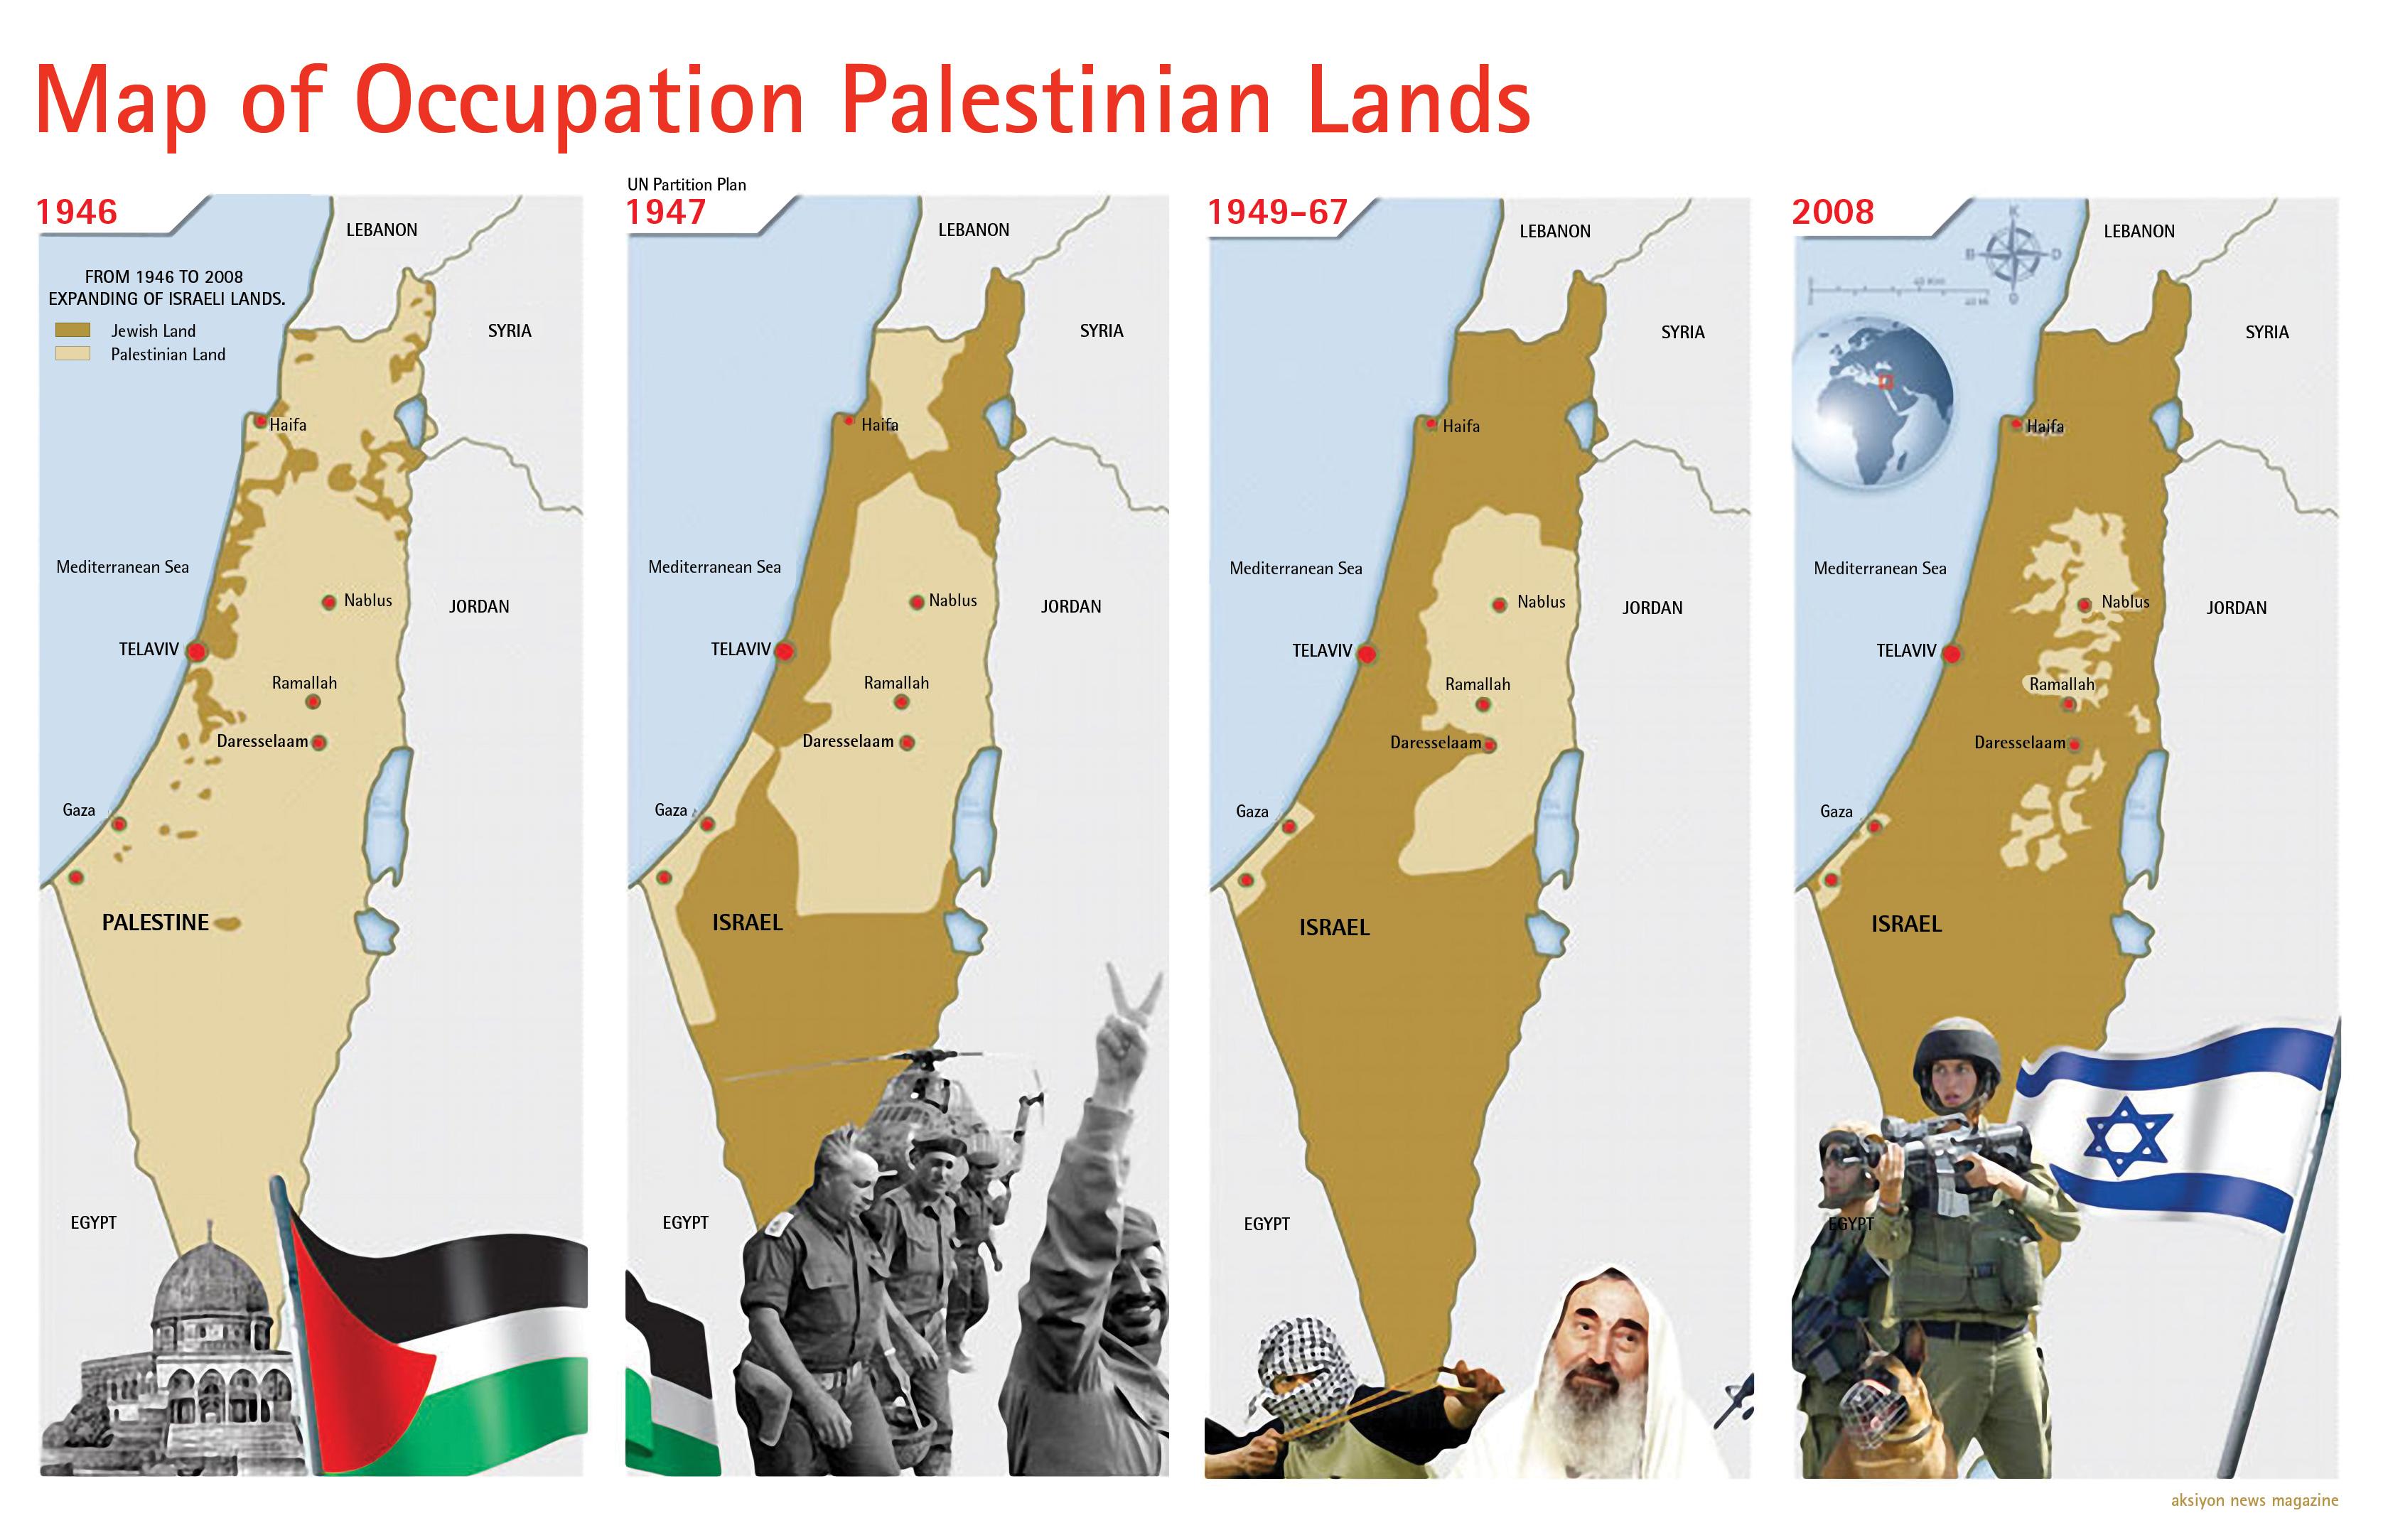 https://fc06.deviantart.net/fs41/f/2009/006/b/2/Map_of_Occupation_Palestinian_by_ademmm.jpg